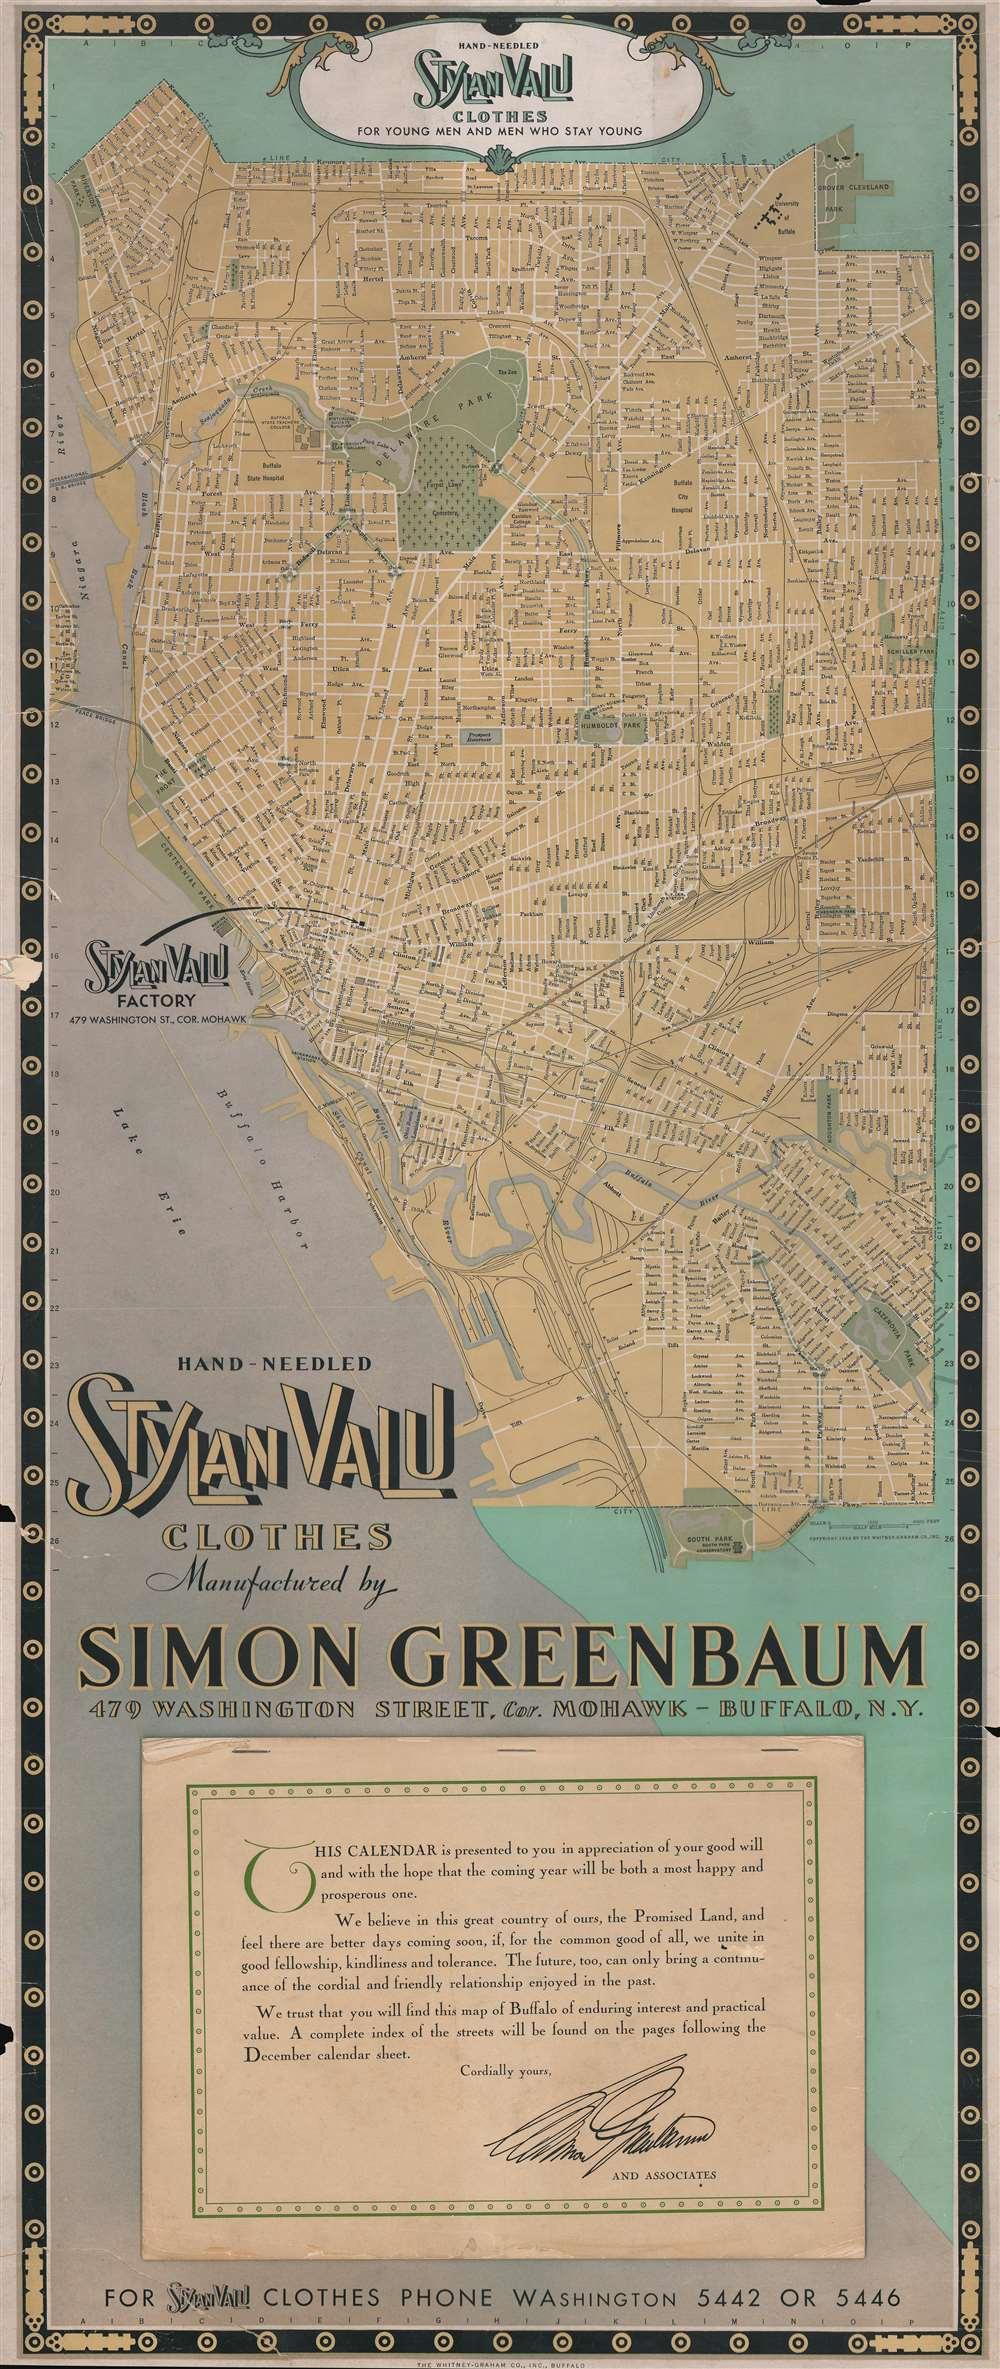 Hand-Needled Stylan Valu Clothes Manufactured by Simon Greenbaum 479 Washington Street, Cor. Mohawk - Buffalo, N.Y.